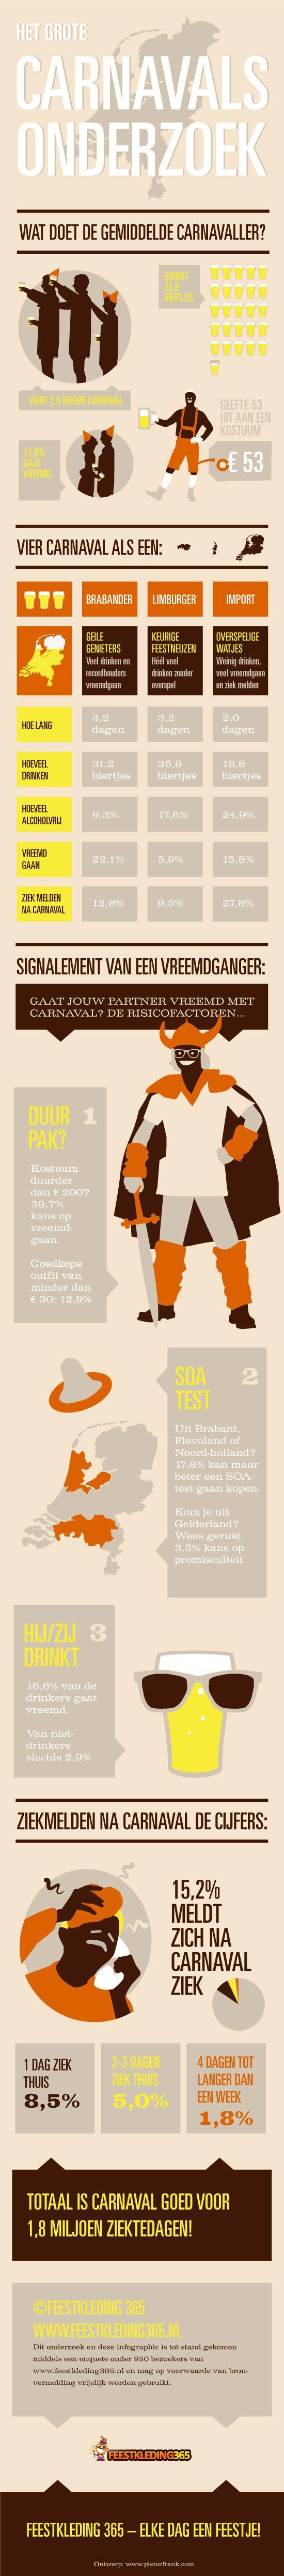 Carnavalsonderzoek infographic (infographic)